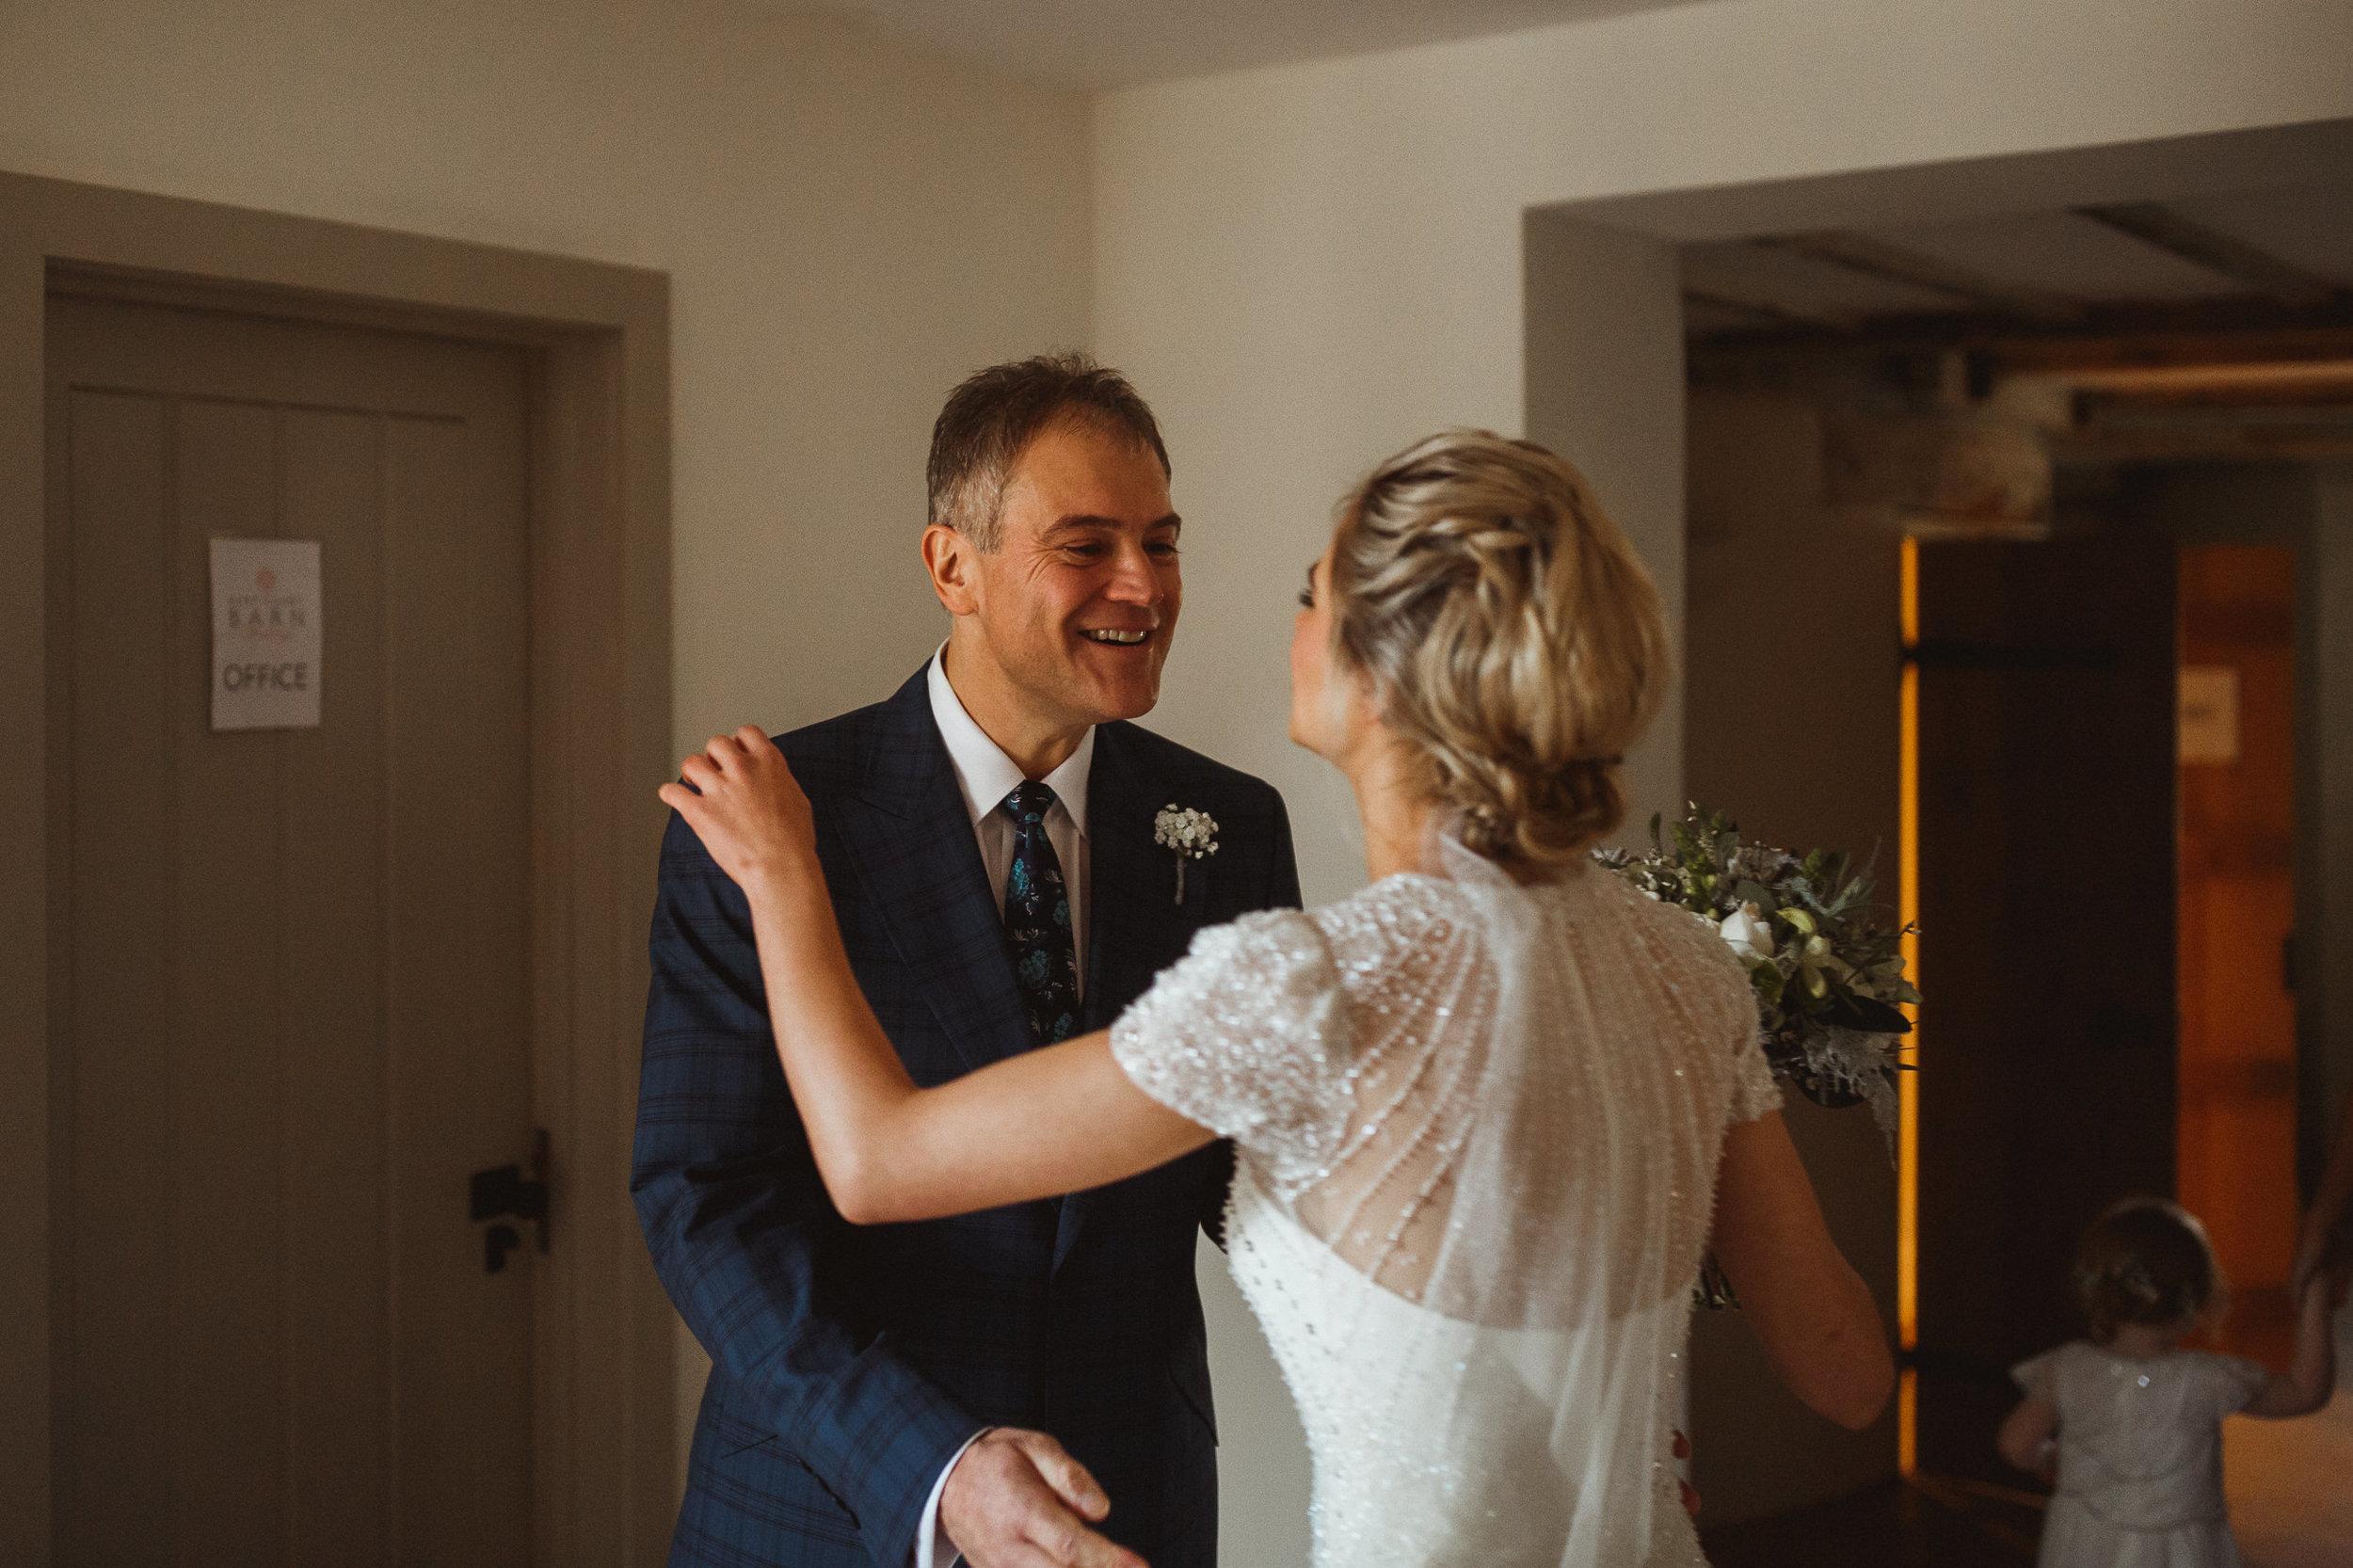 London_wedding_photographer_gione_da_silva_carelle_paul107.jpg